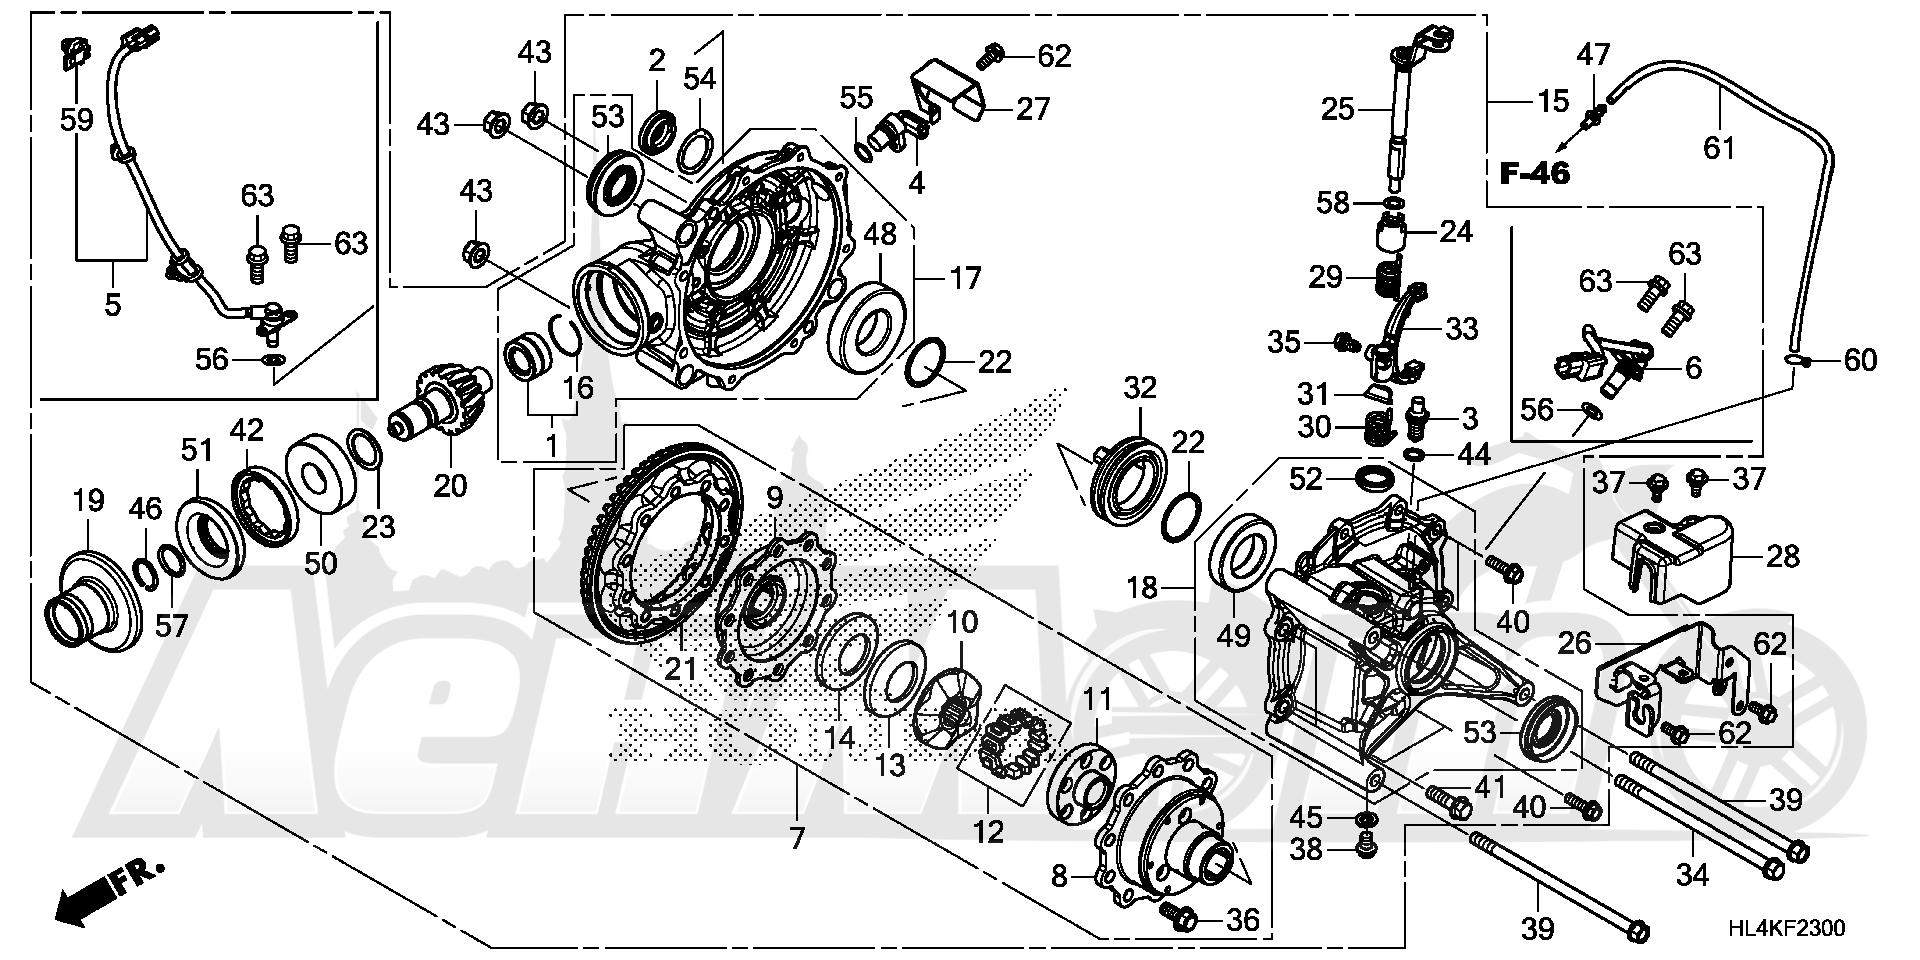 Запчасти для Квадроцикла Honda 2019 SXS1000M5P Раздел: FINAL DRIVEN GEAR   FINAL ведомый шестерня